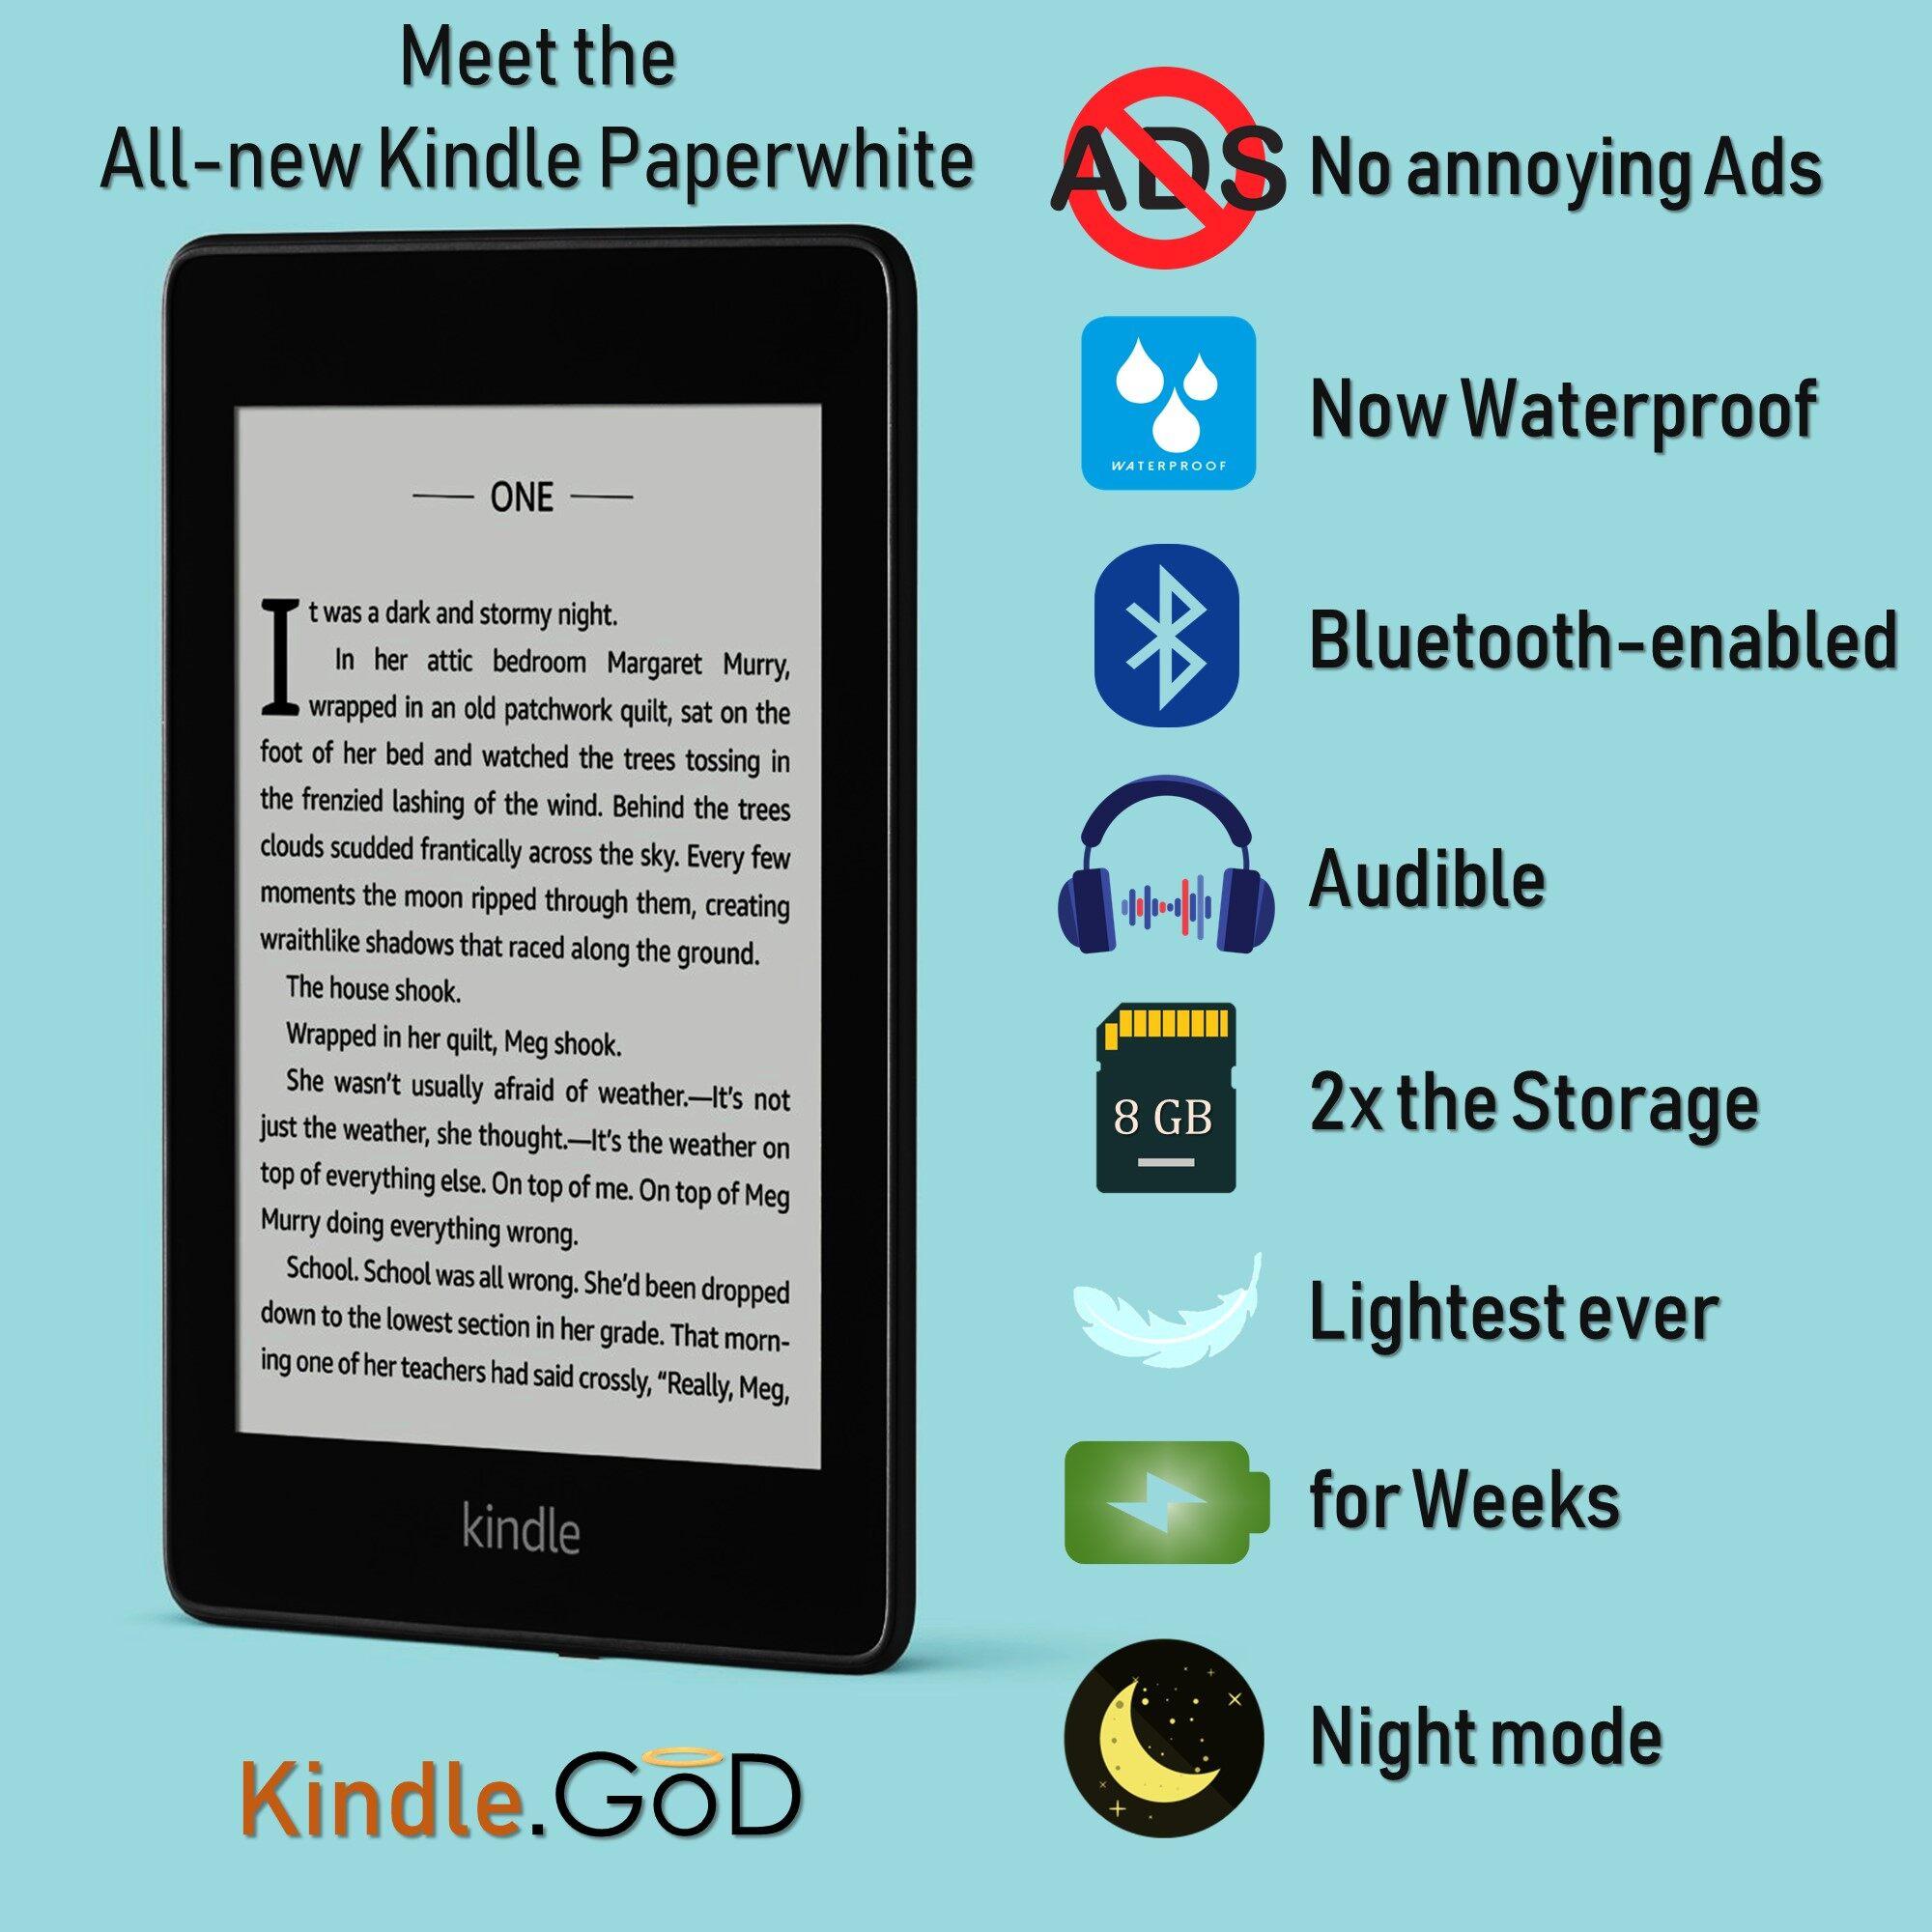 Kindle Paperwhite 4 2018 (10th Gen) - No Ads + Waterproof + 8 GB Storage